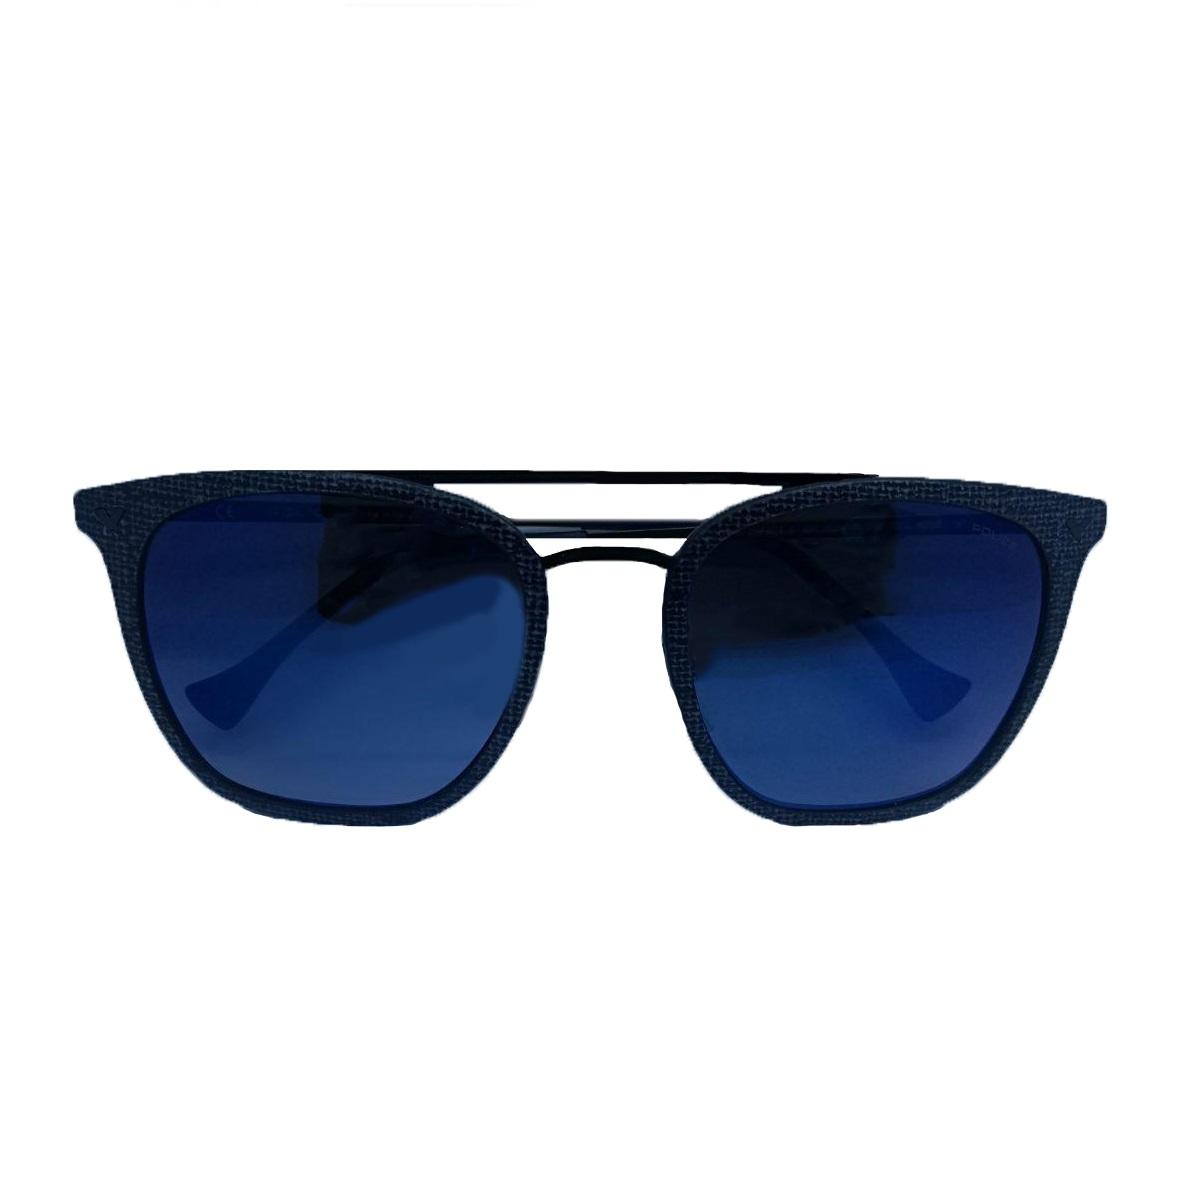 عینک آفتابی پلیس مدل 3IMPACT 1 SPL 152N COL AG2B